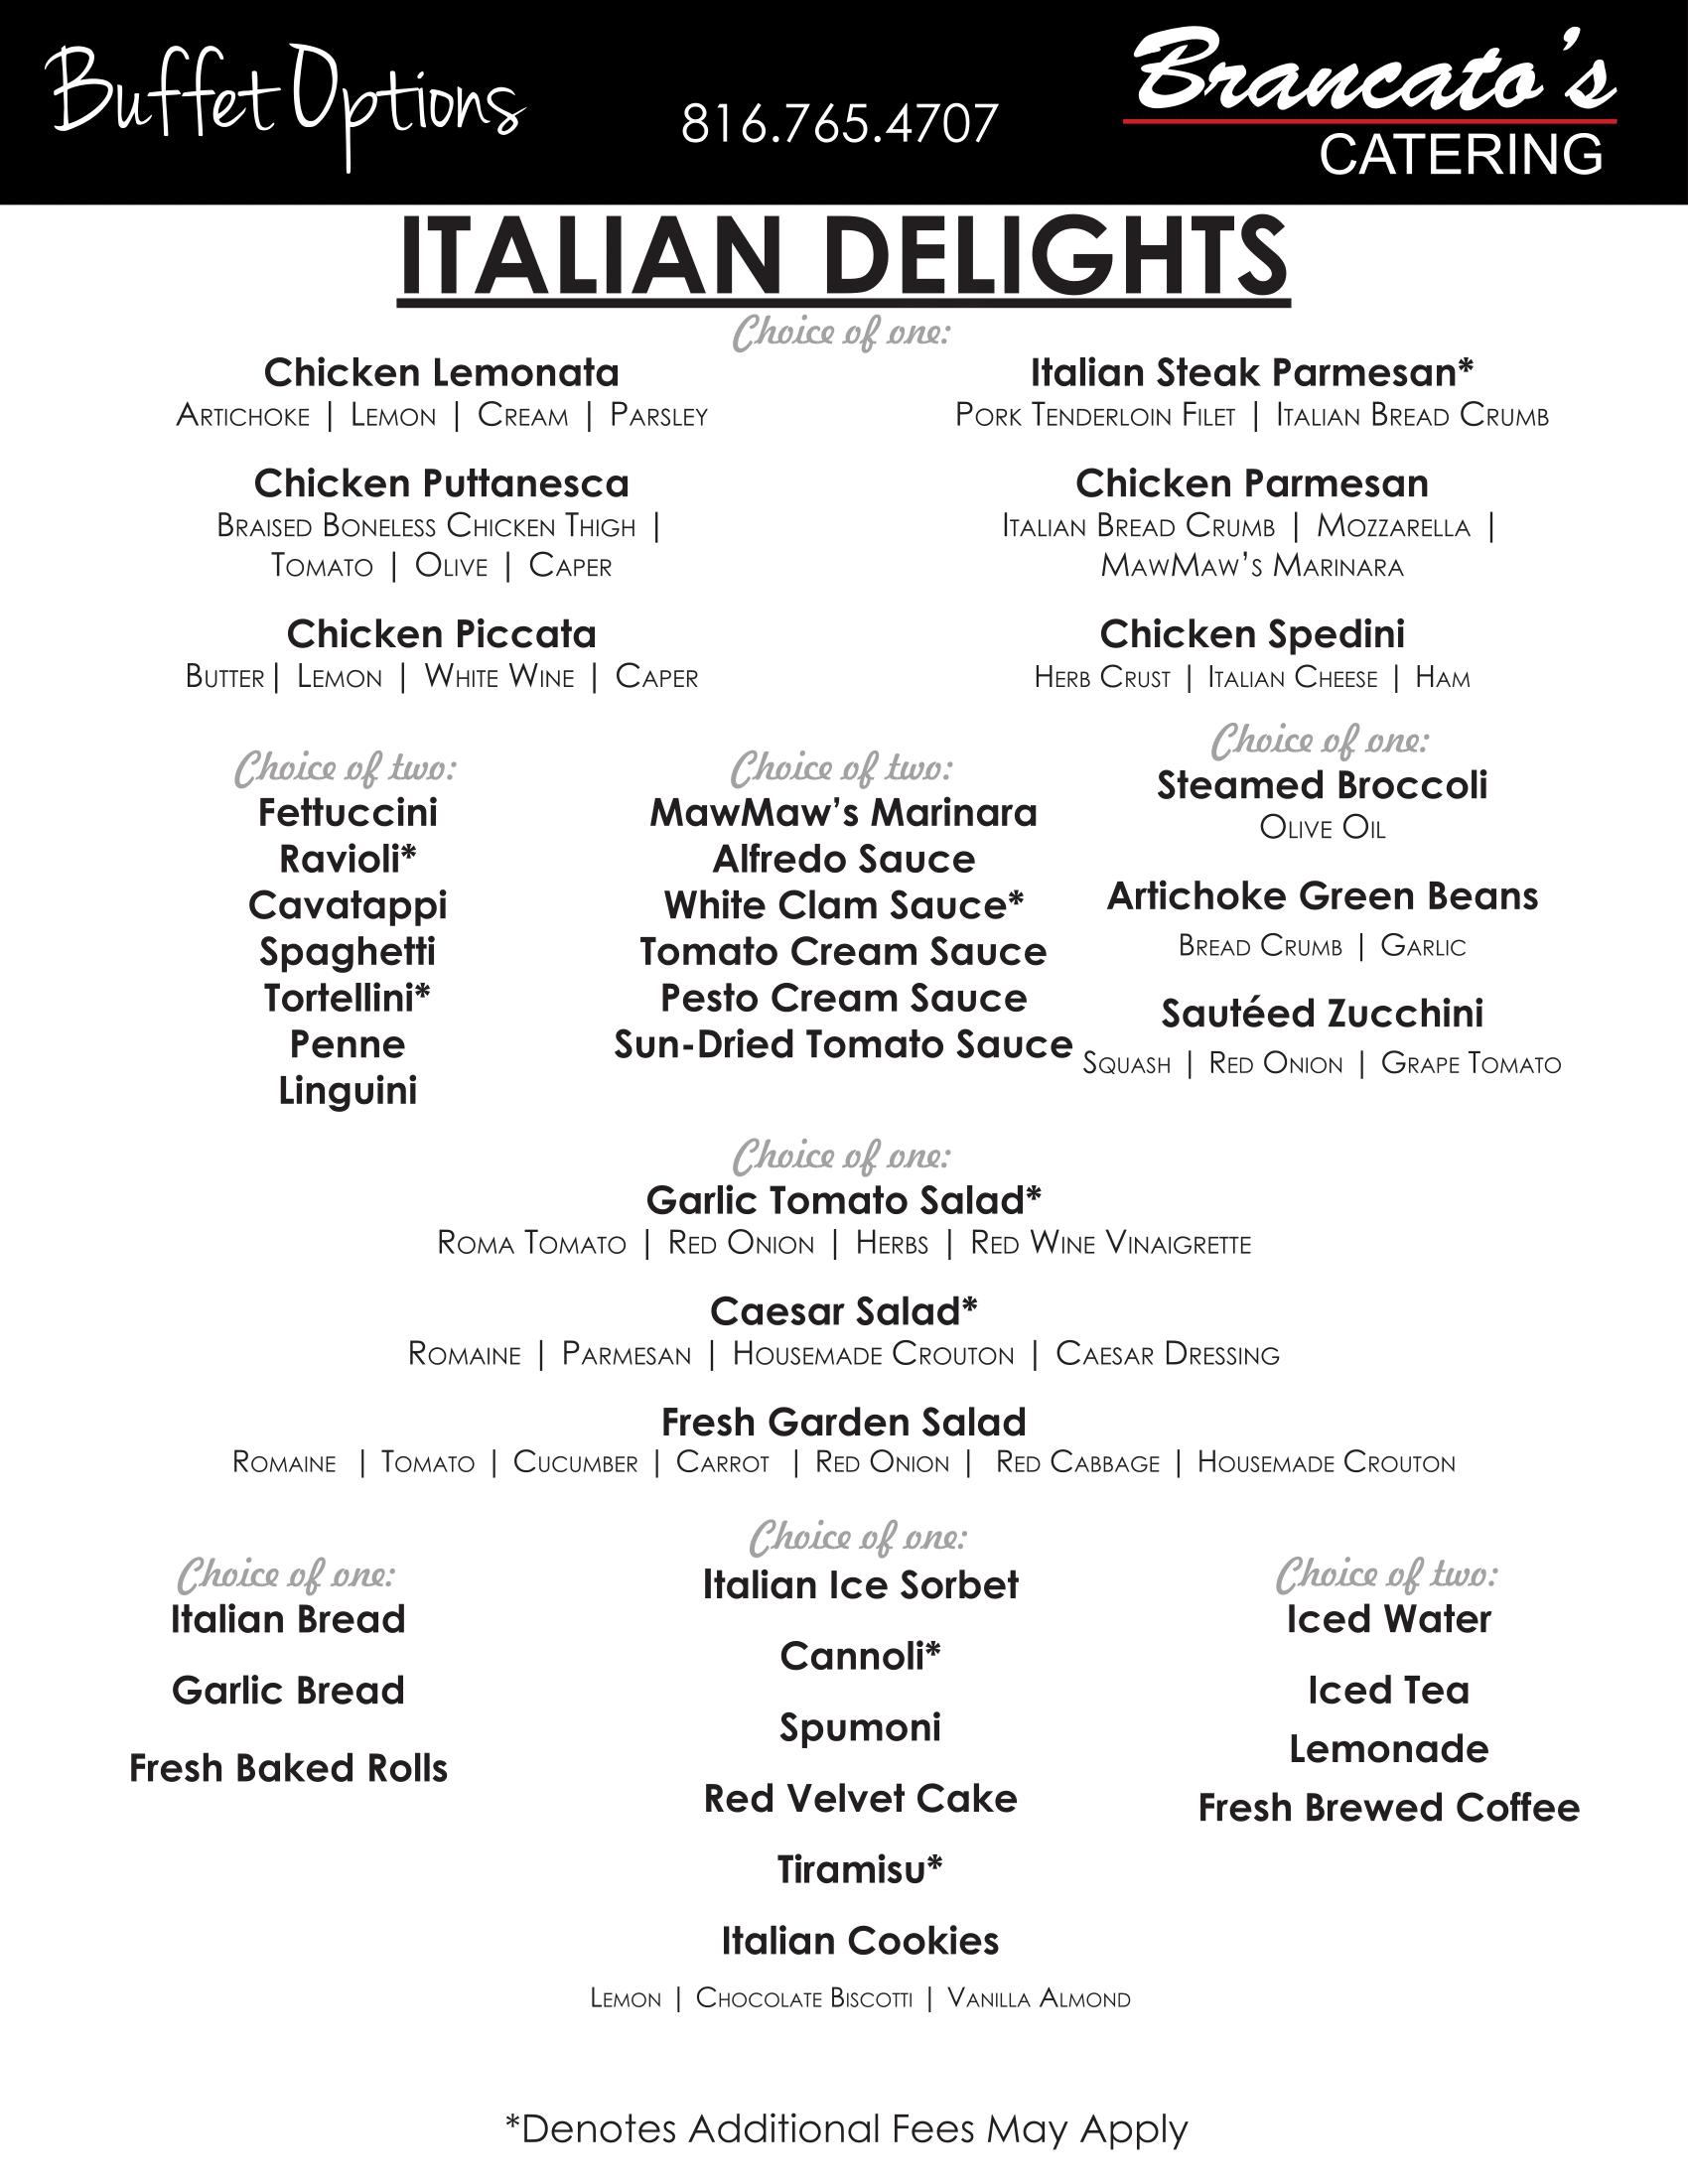 italian delights-1